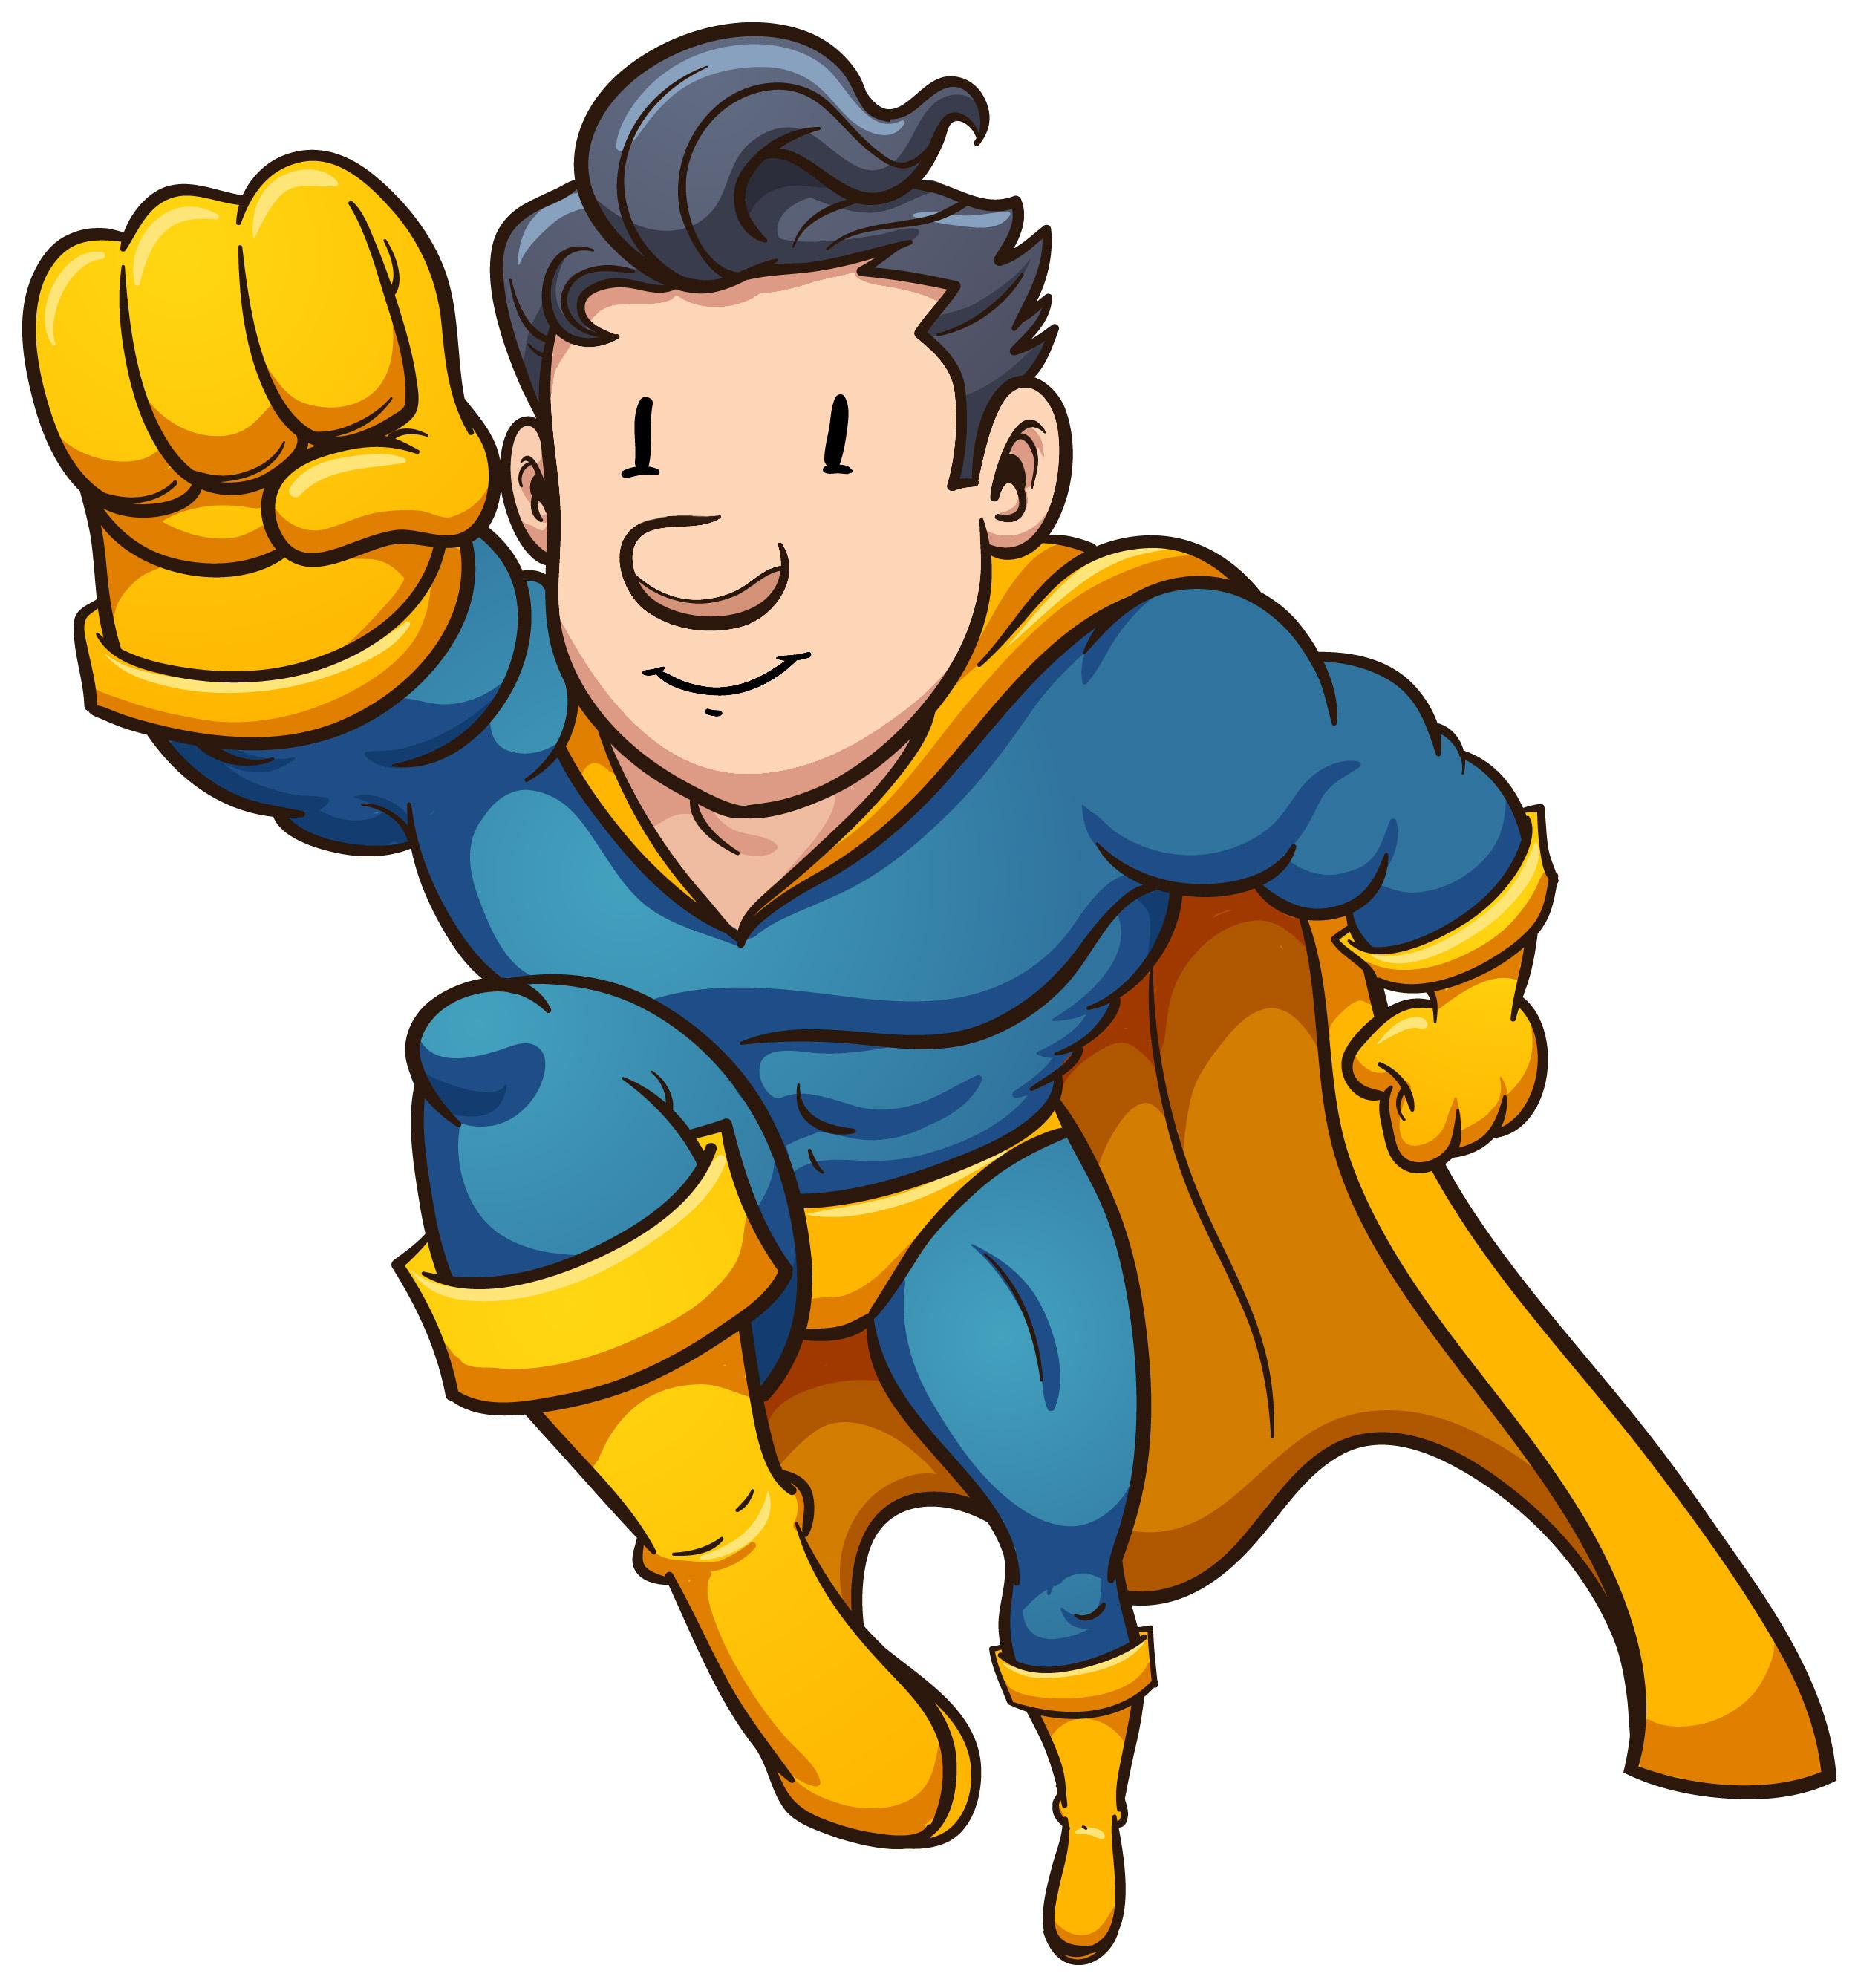 Superhero 1 clipart clipart royalty free Free Kid Superhero Clipart, Download Free Clip Art, Free ... clipart royalty free